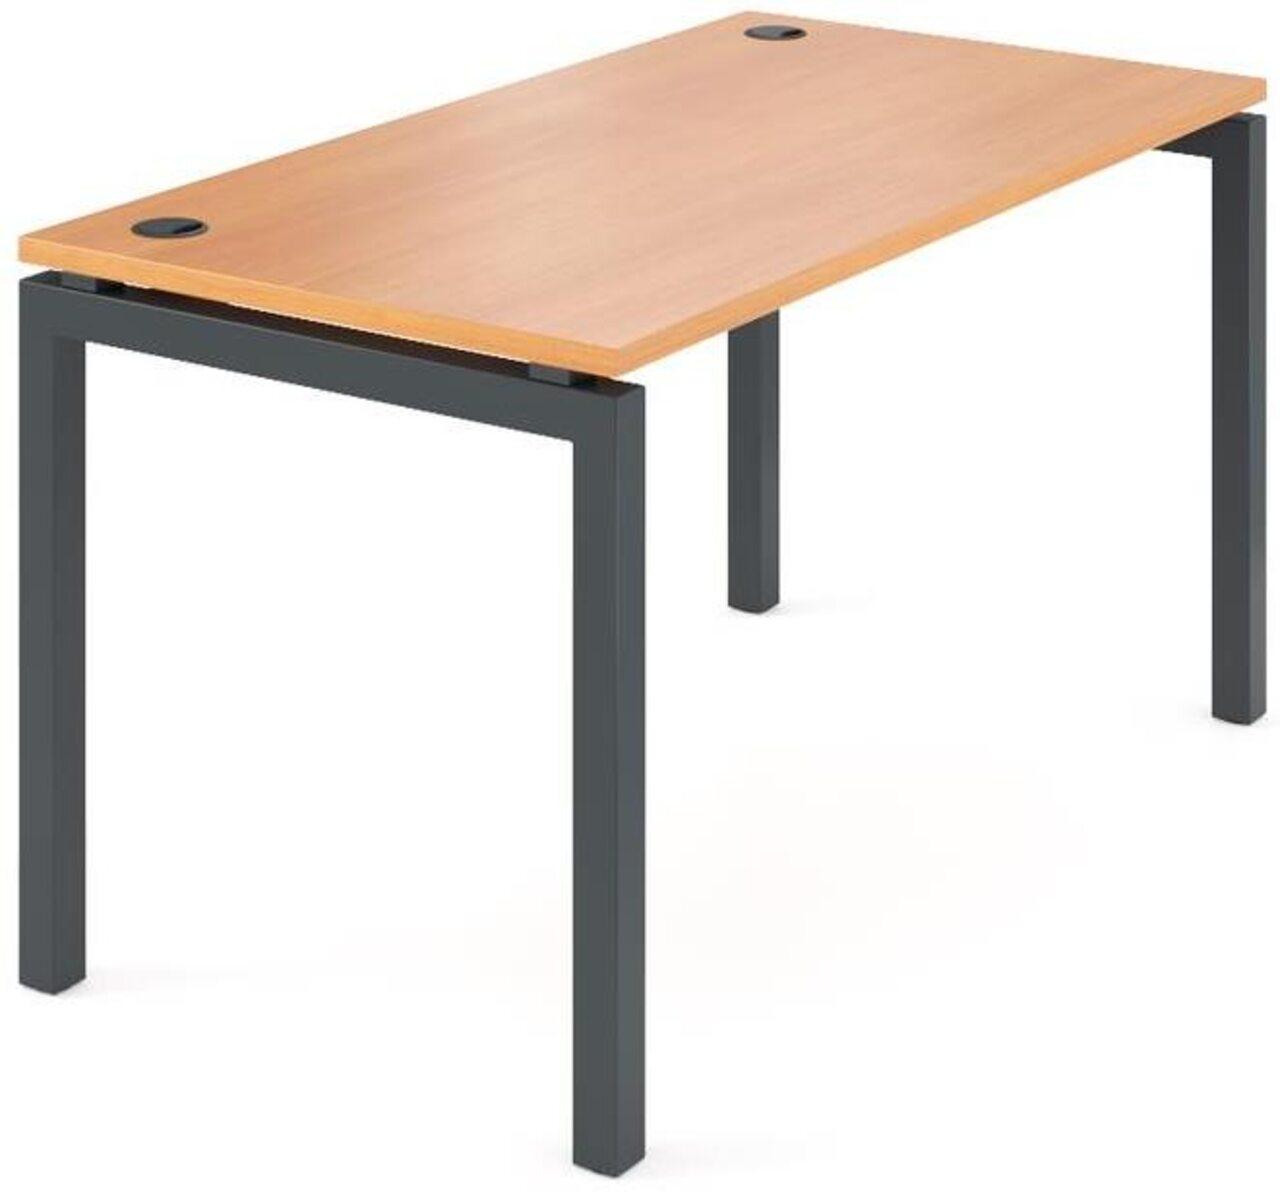 Стол на металлокаркасе  Арго 140x73x76 - фото 7